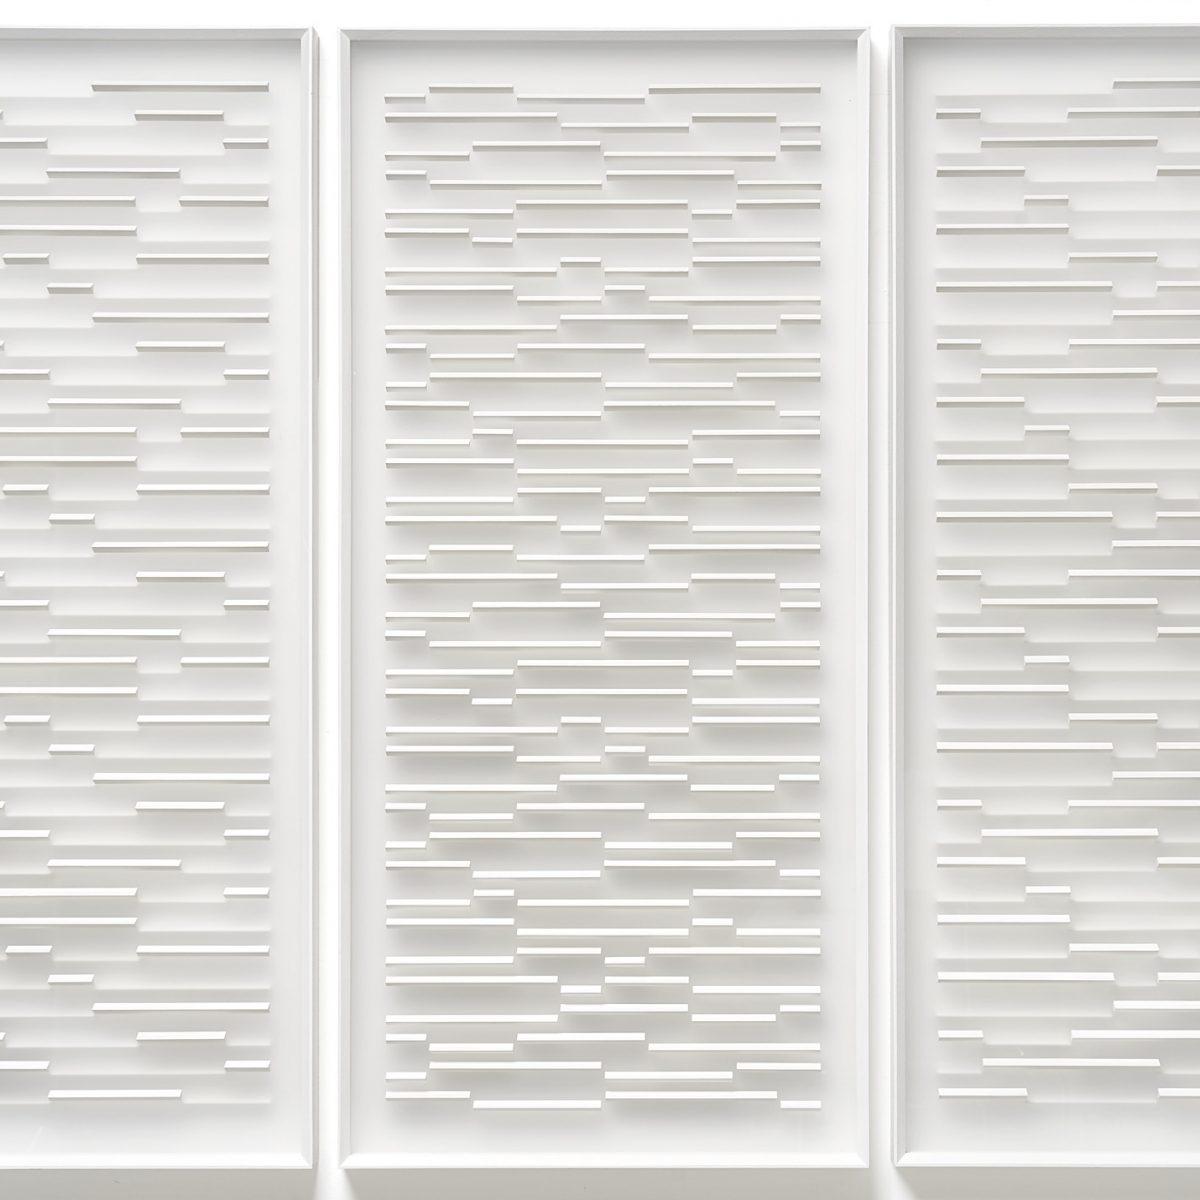 08 Klaus Staudt, Zukunft, (dreiteilig), 2017, 114 x 164 x 6,7cm, Holz, Acrylfarbe, Plexiglas; Foto: Norbert Miguletz